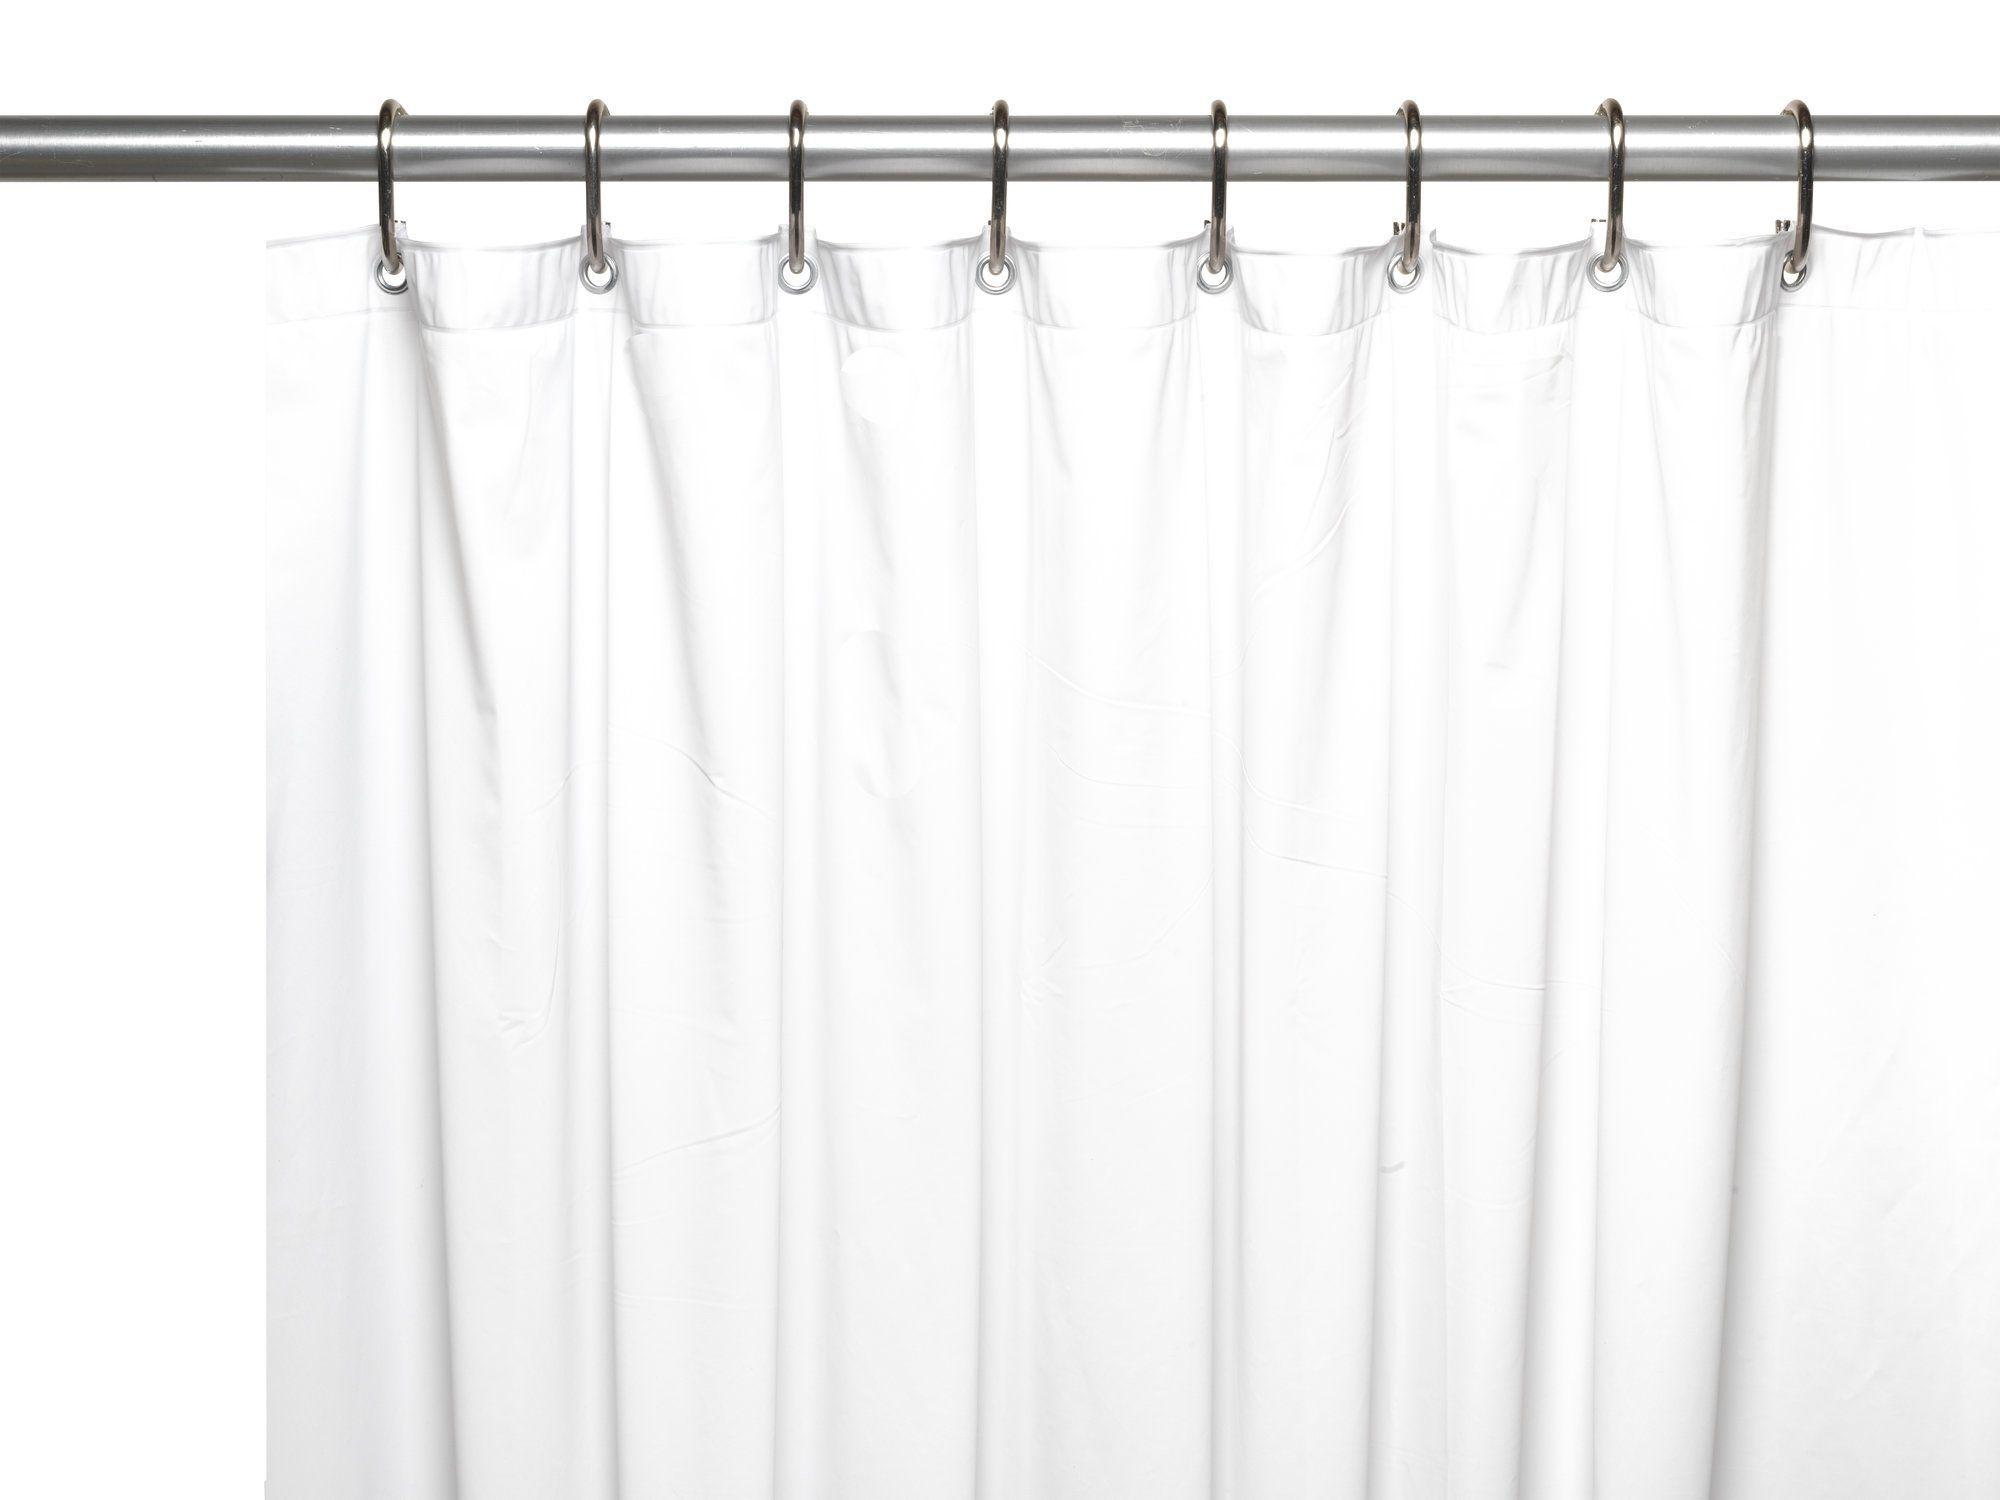 Burwood Vinyl Shower Curtain Liner Vinyl Shower Curtains Shower